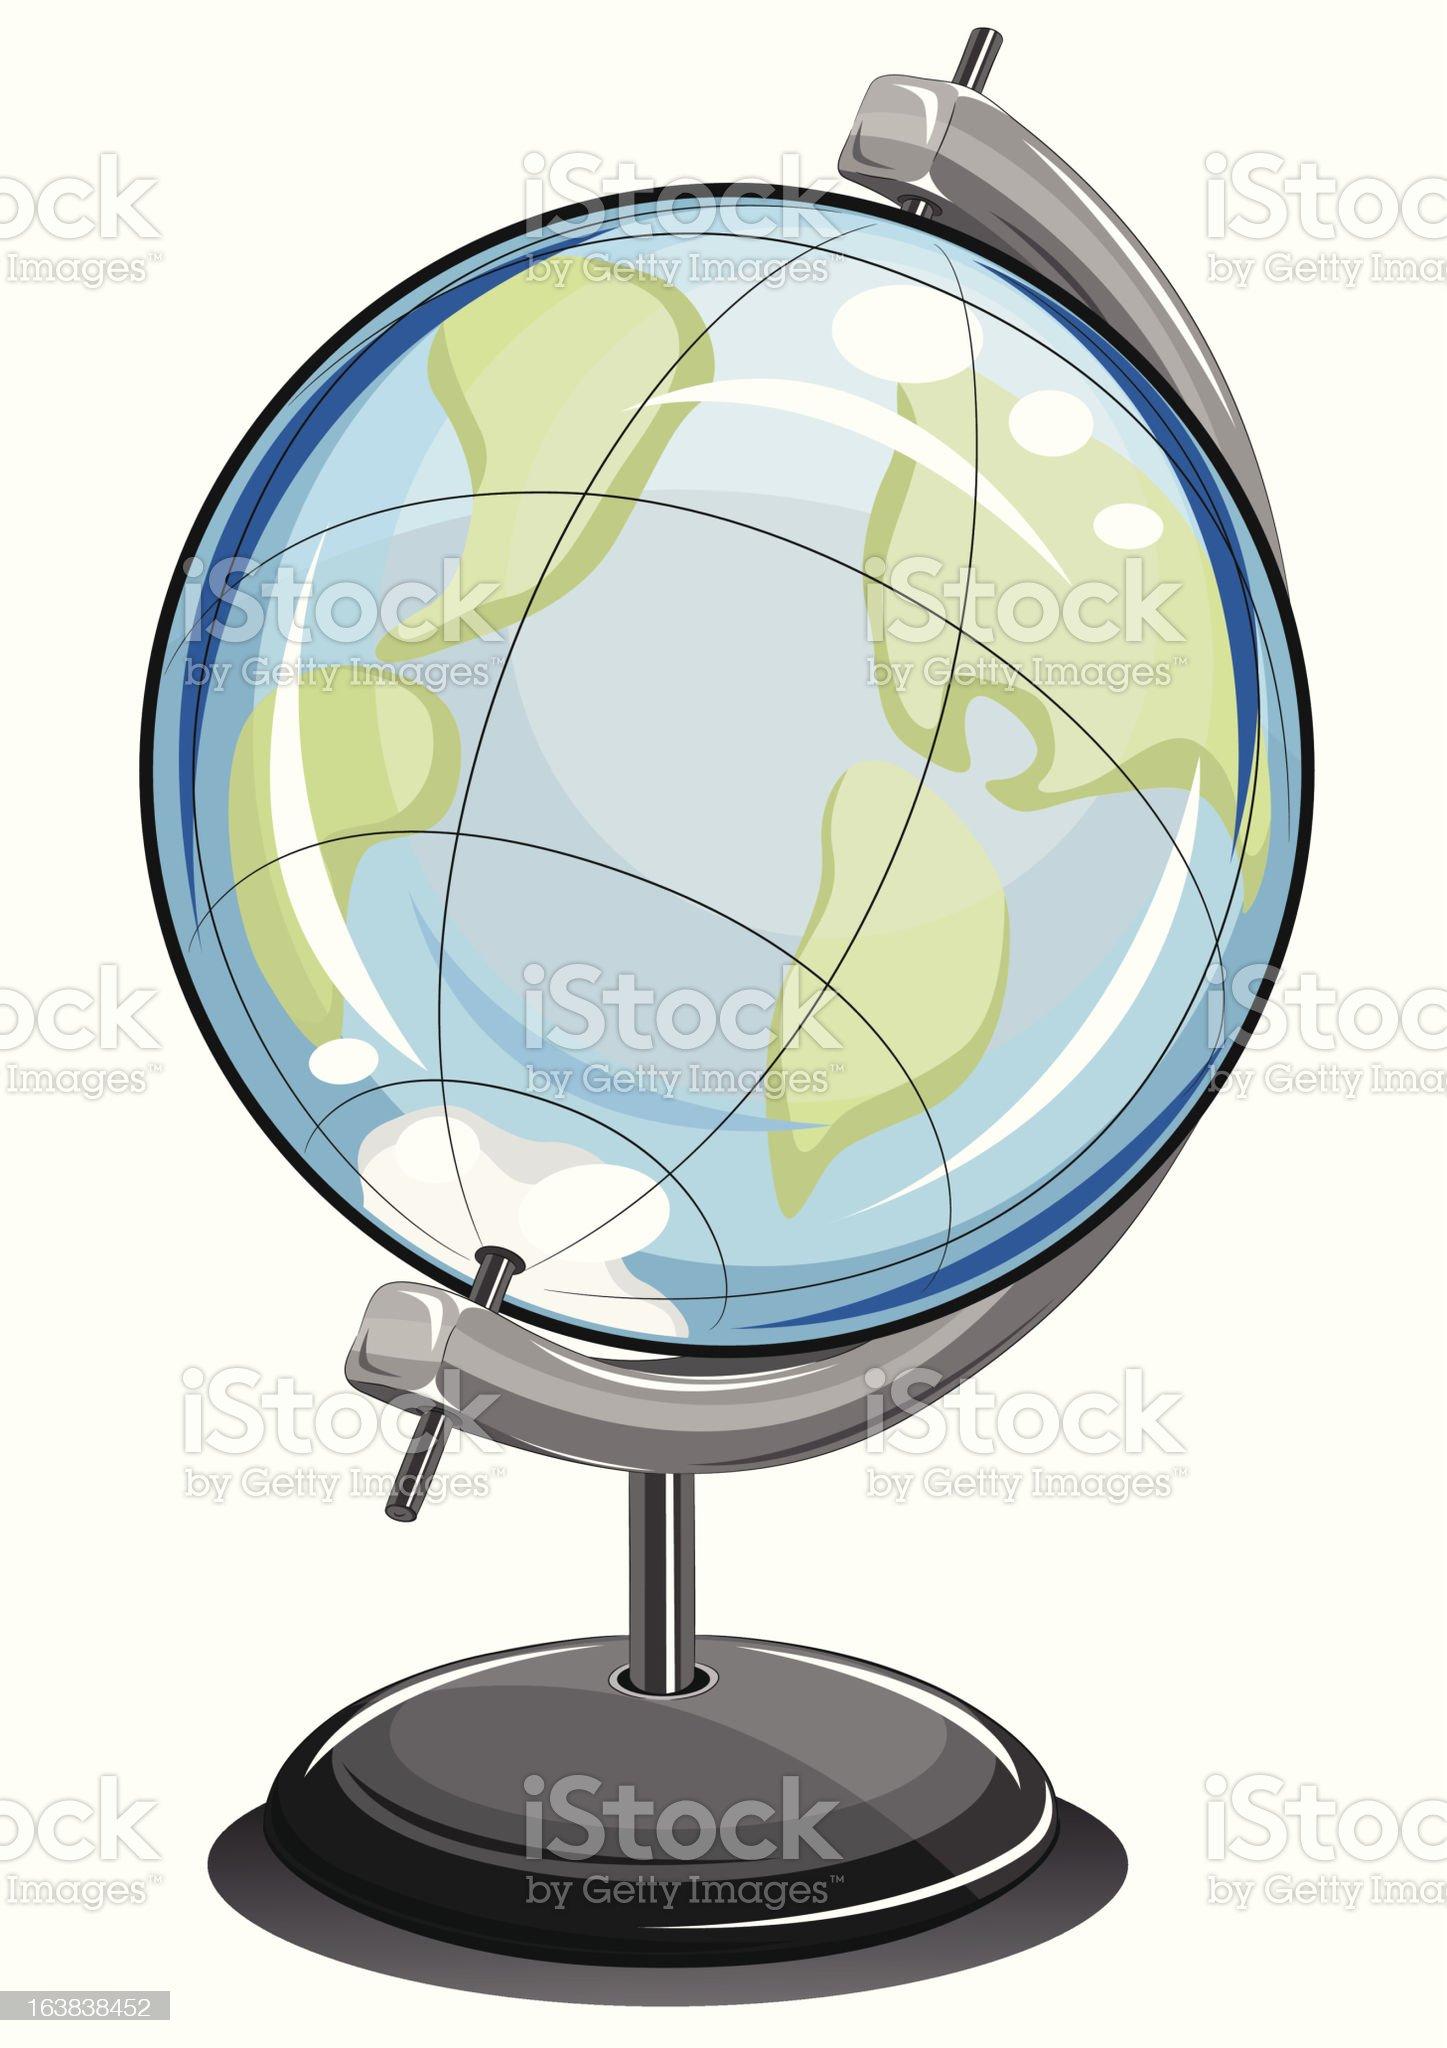 globe earthly ball royalty-free stock vector art